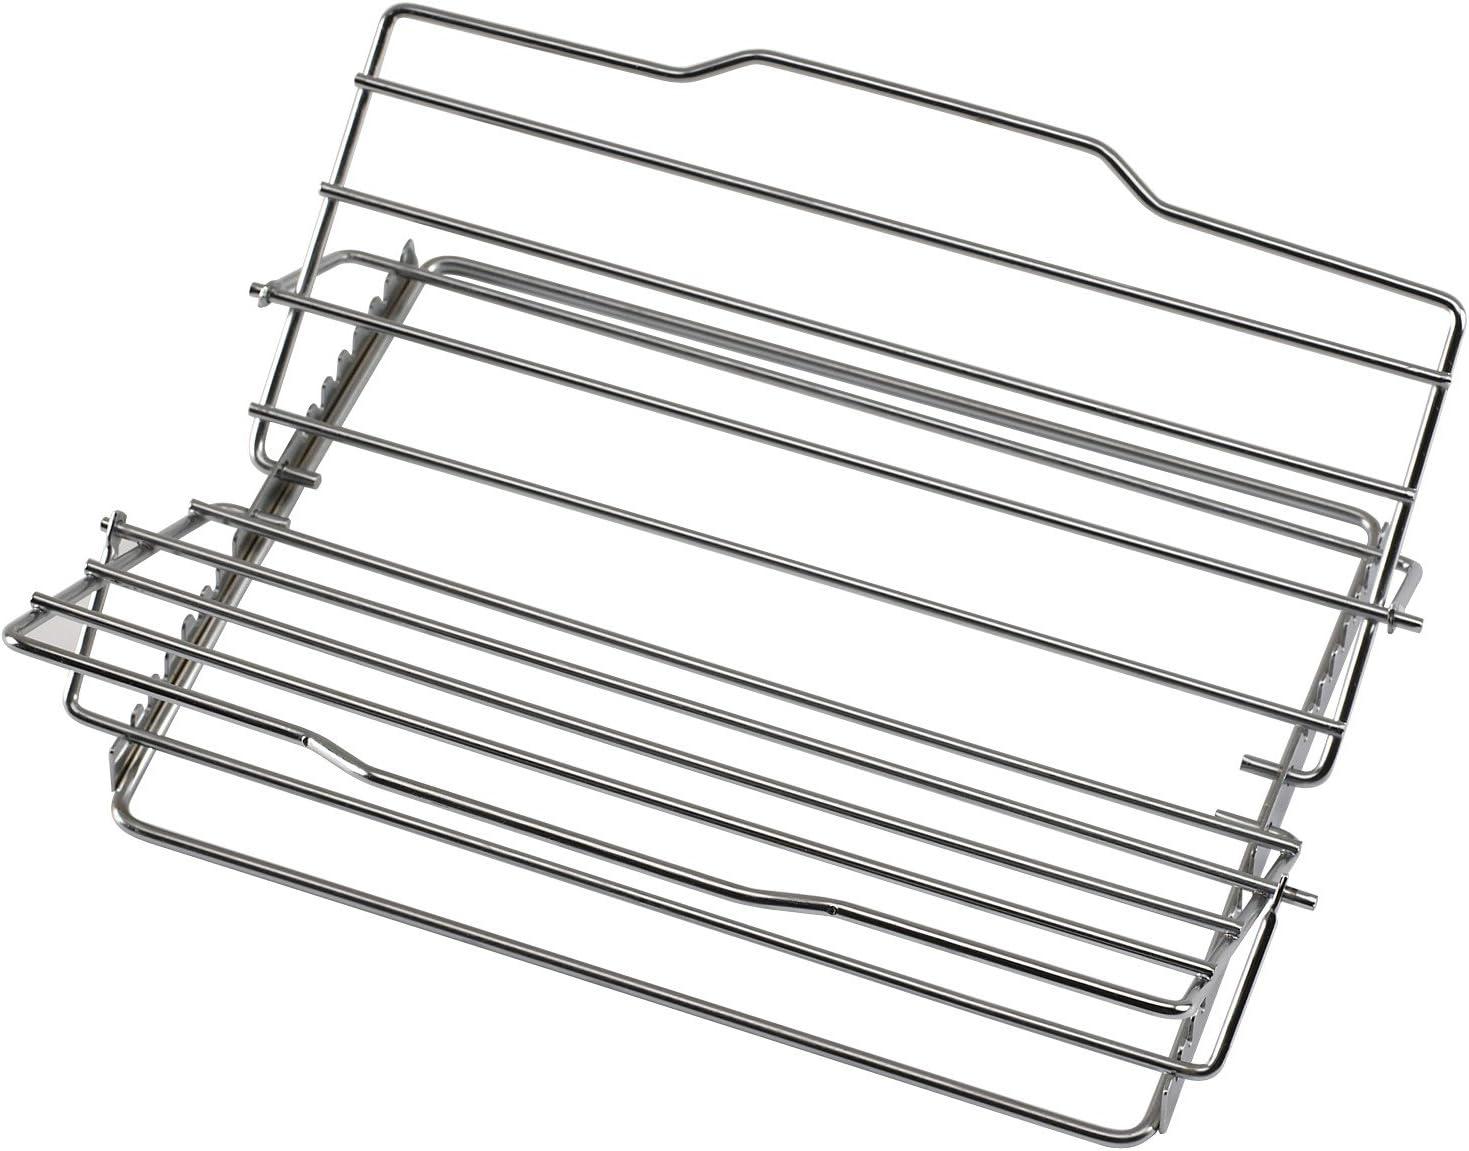 BRADSHAW INTERNATIONAL 23803 Chrome Adjustable Roast Rack